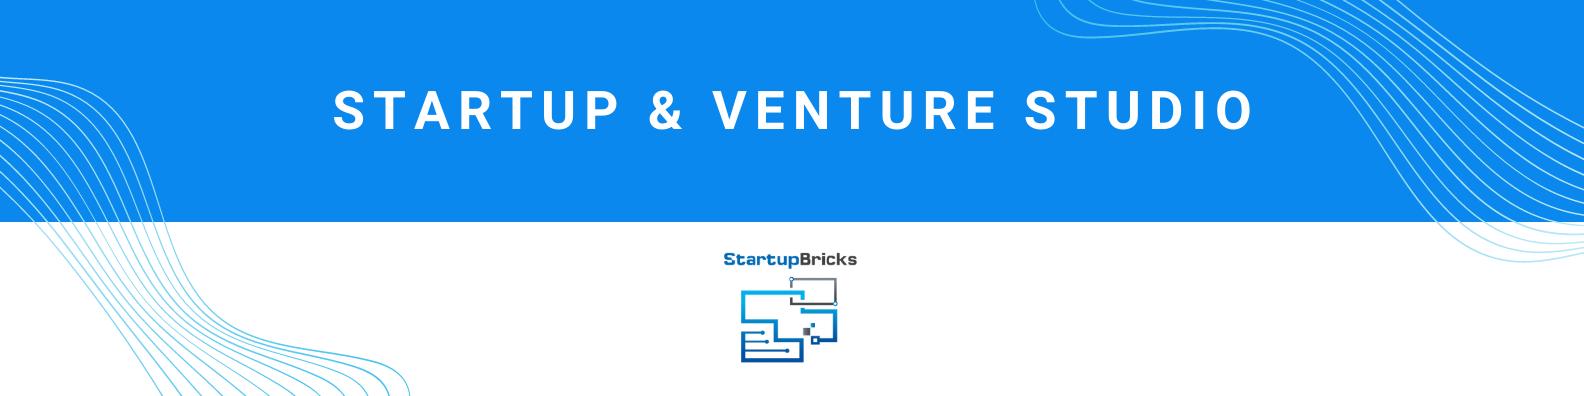 venture studio startup